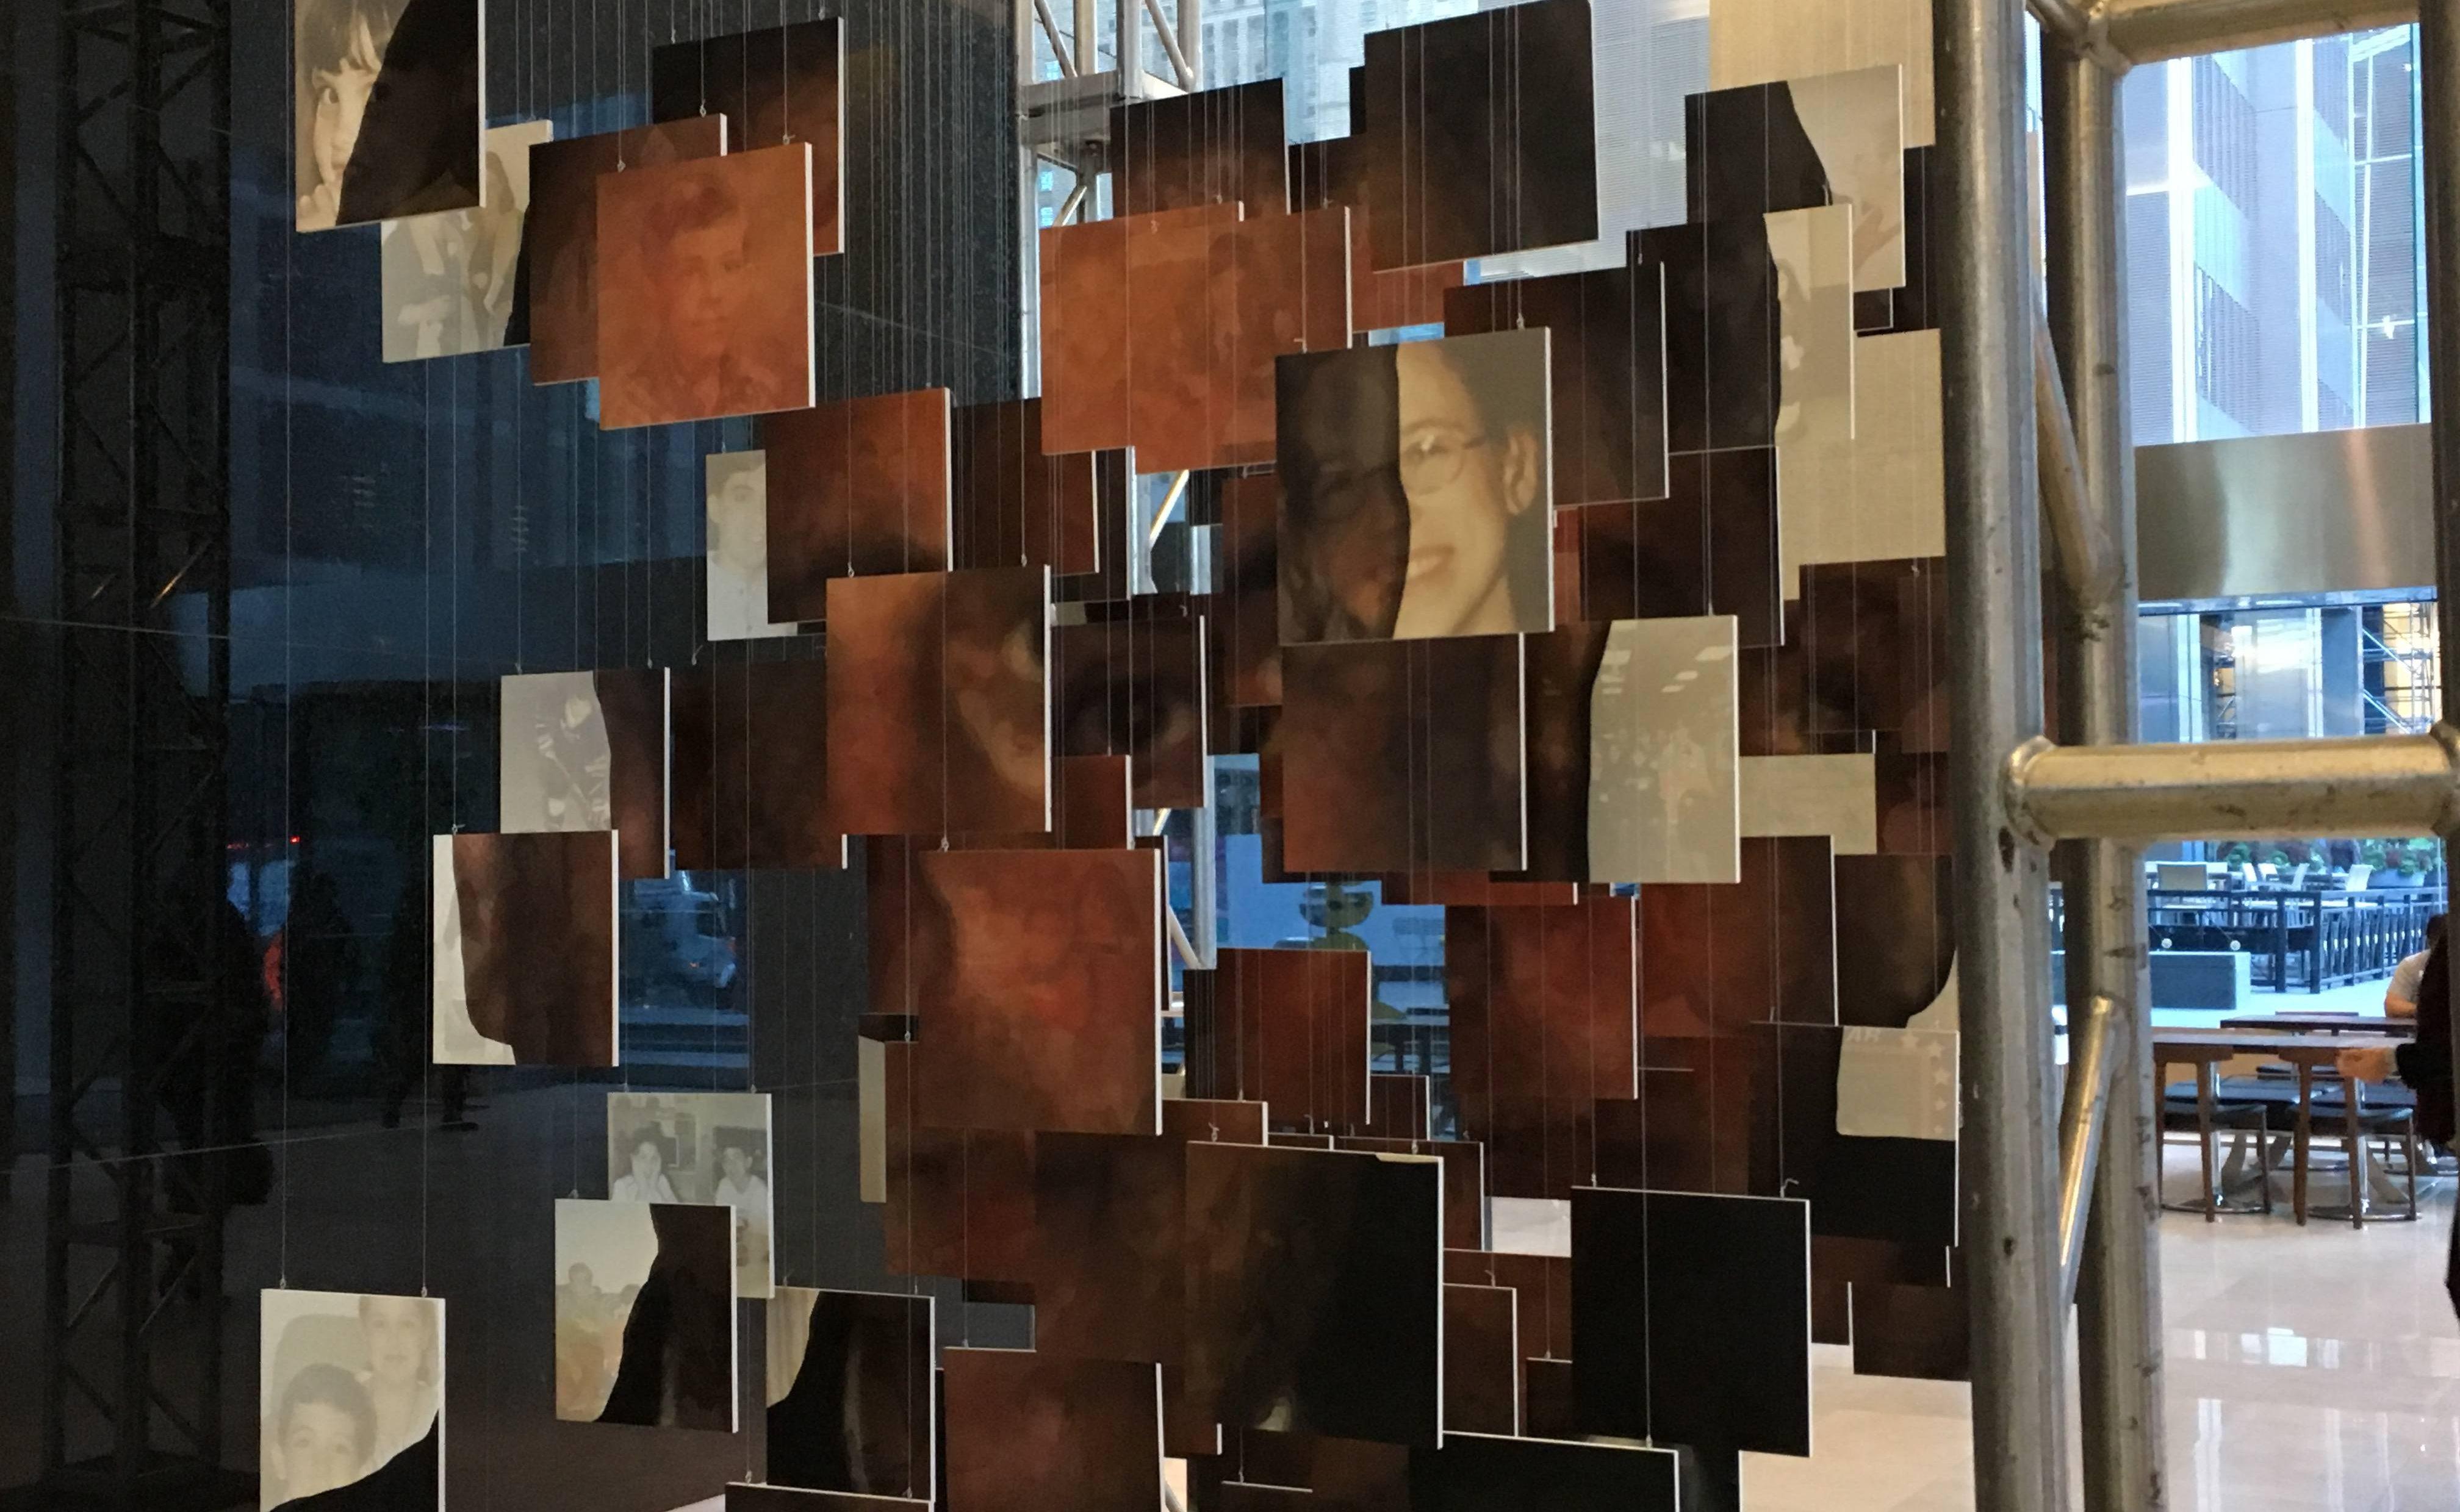 Amazing new art exhibit in Toronto centres around the wrongfully convicted